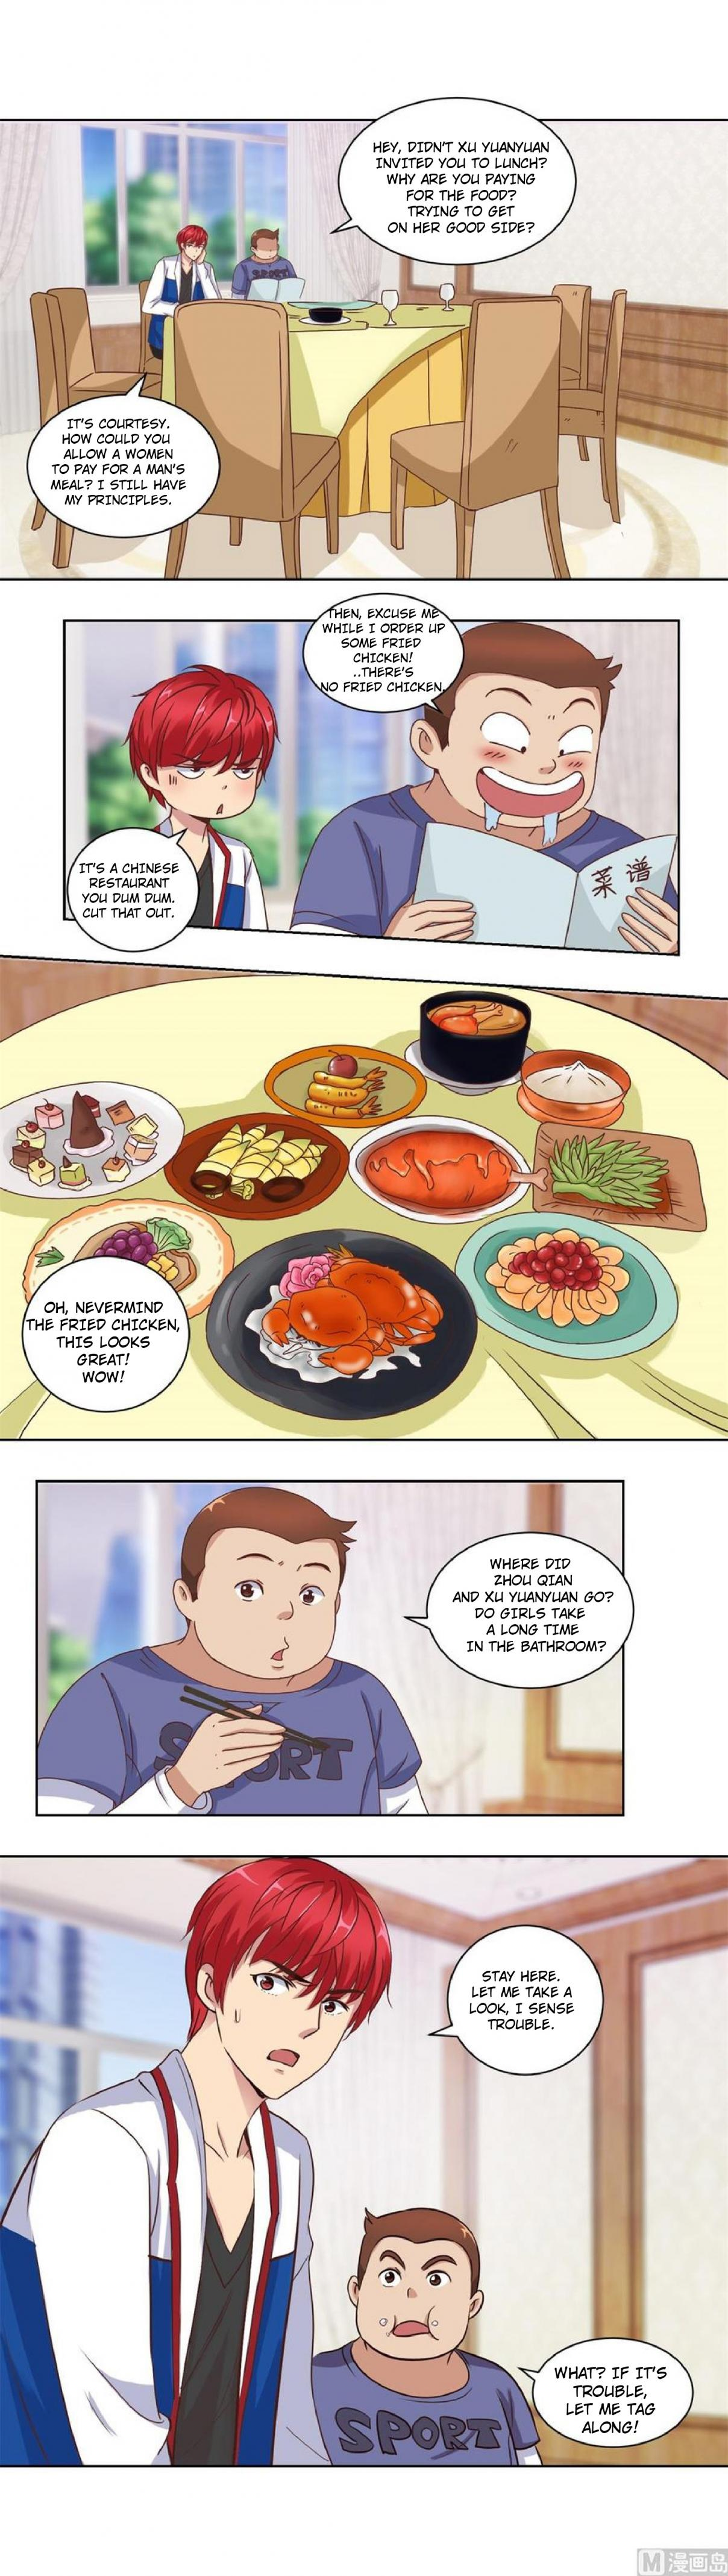 https://manga.mangadogs.com/comics/pic2/36/32036/971528/bdffc7973c9f8f88ab4effb397c59f92.jpg Page 1